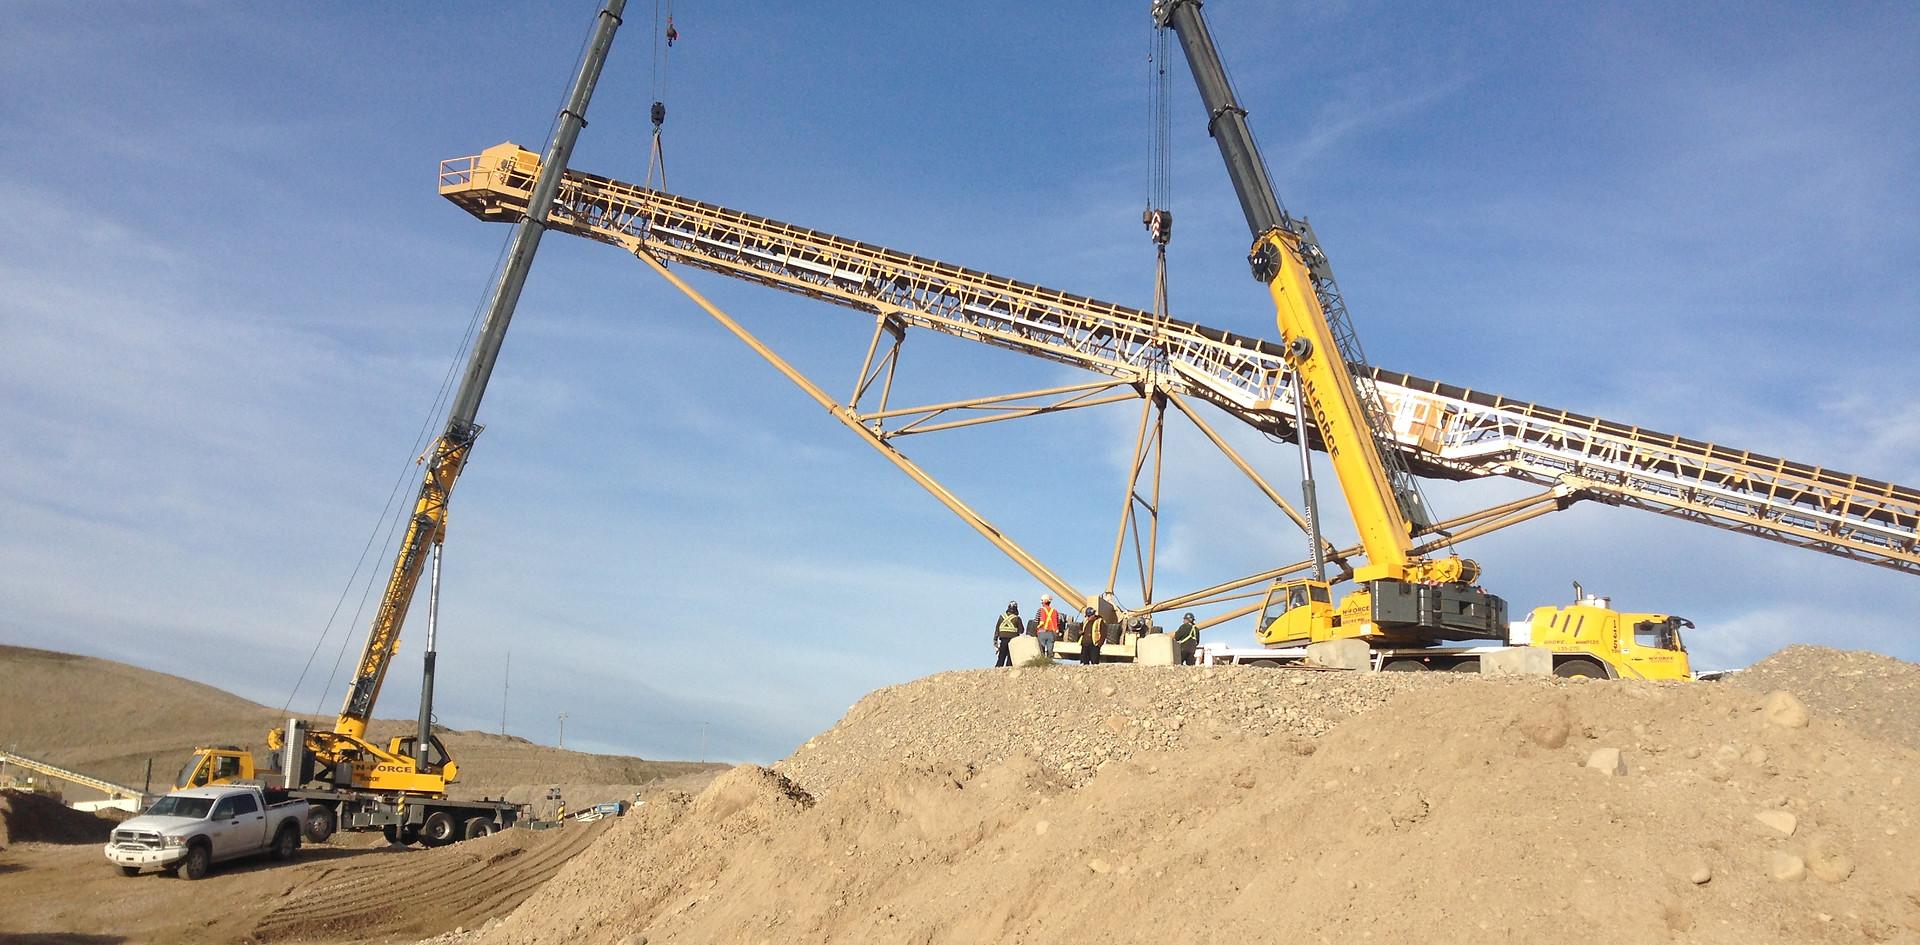 Multi crane work